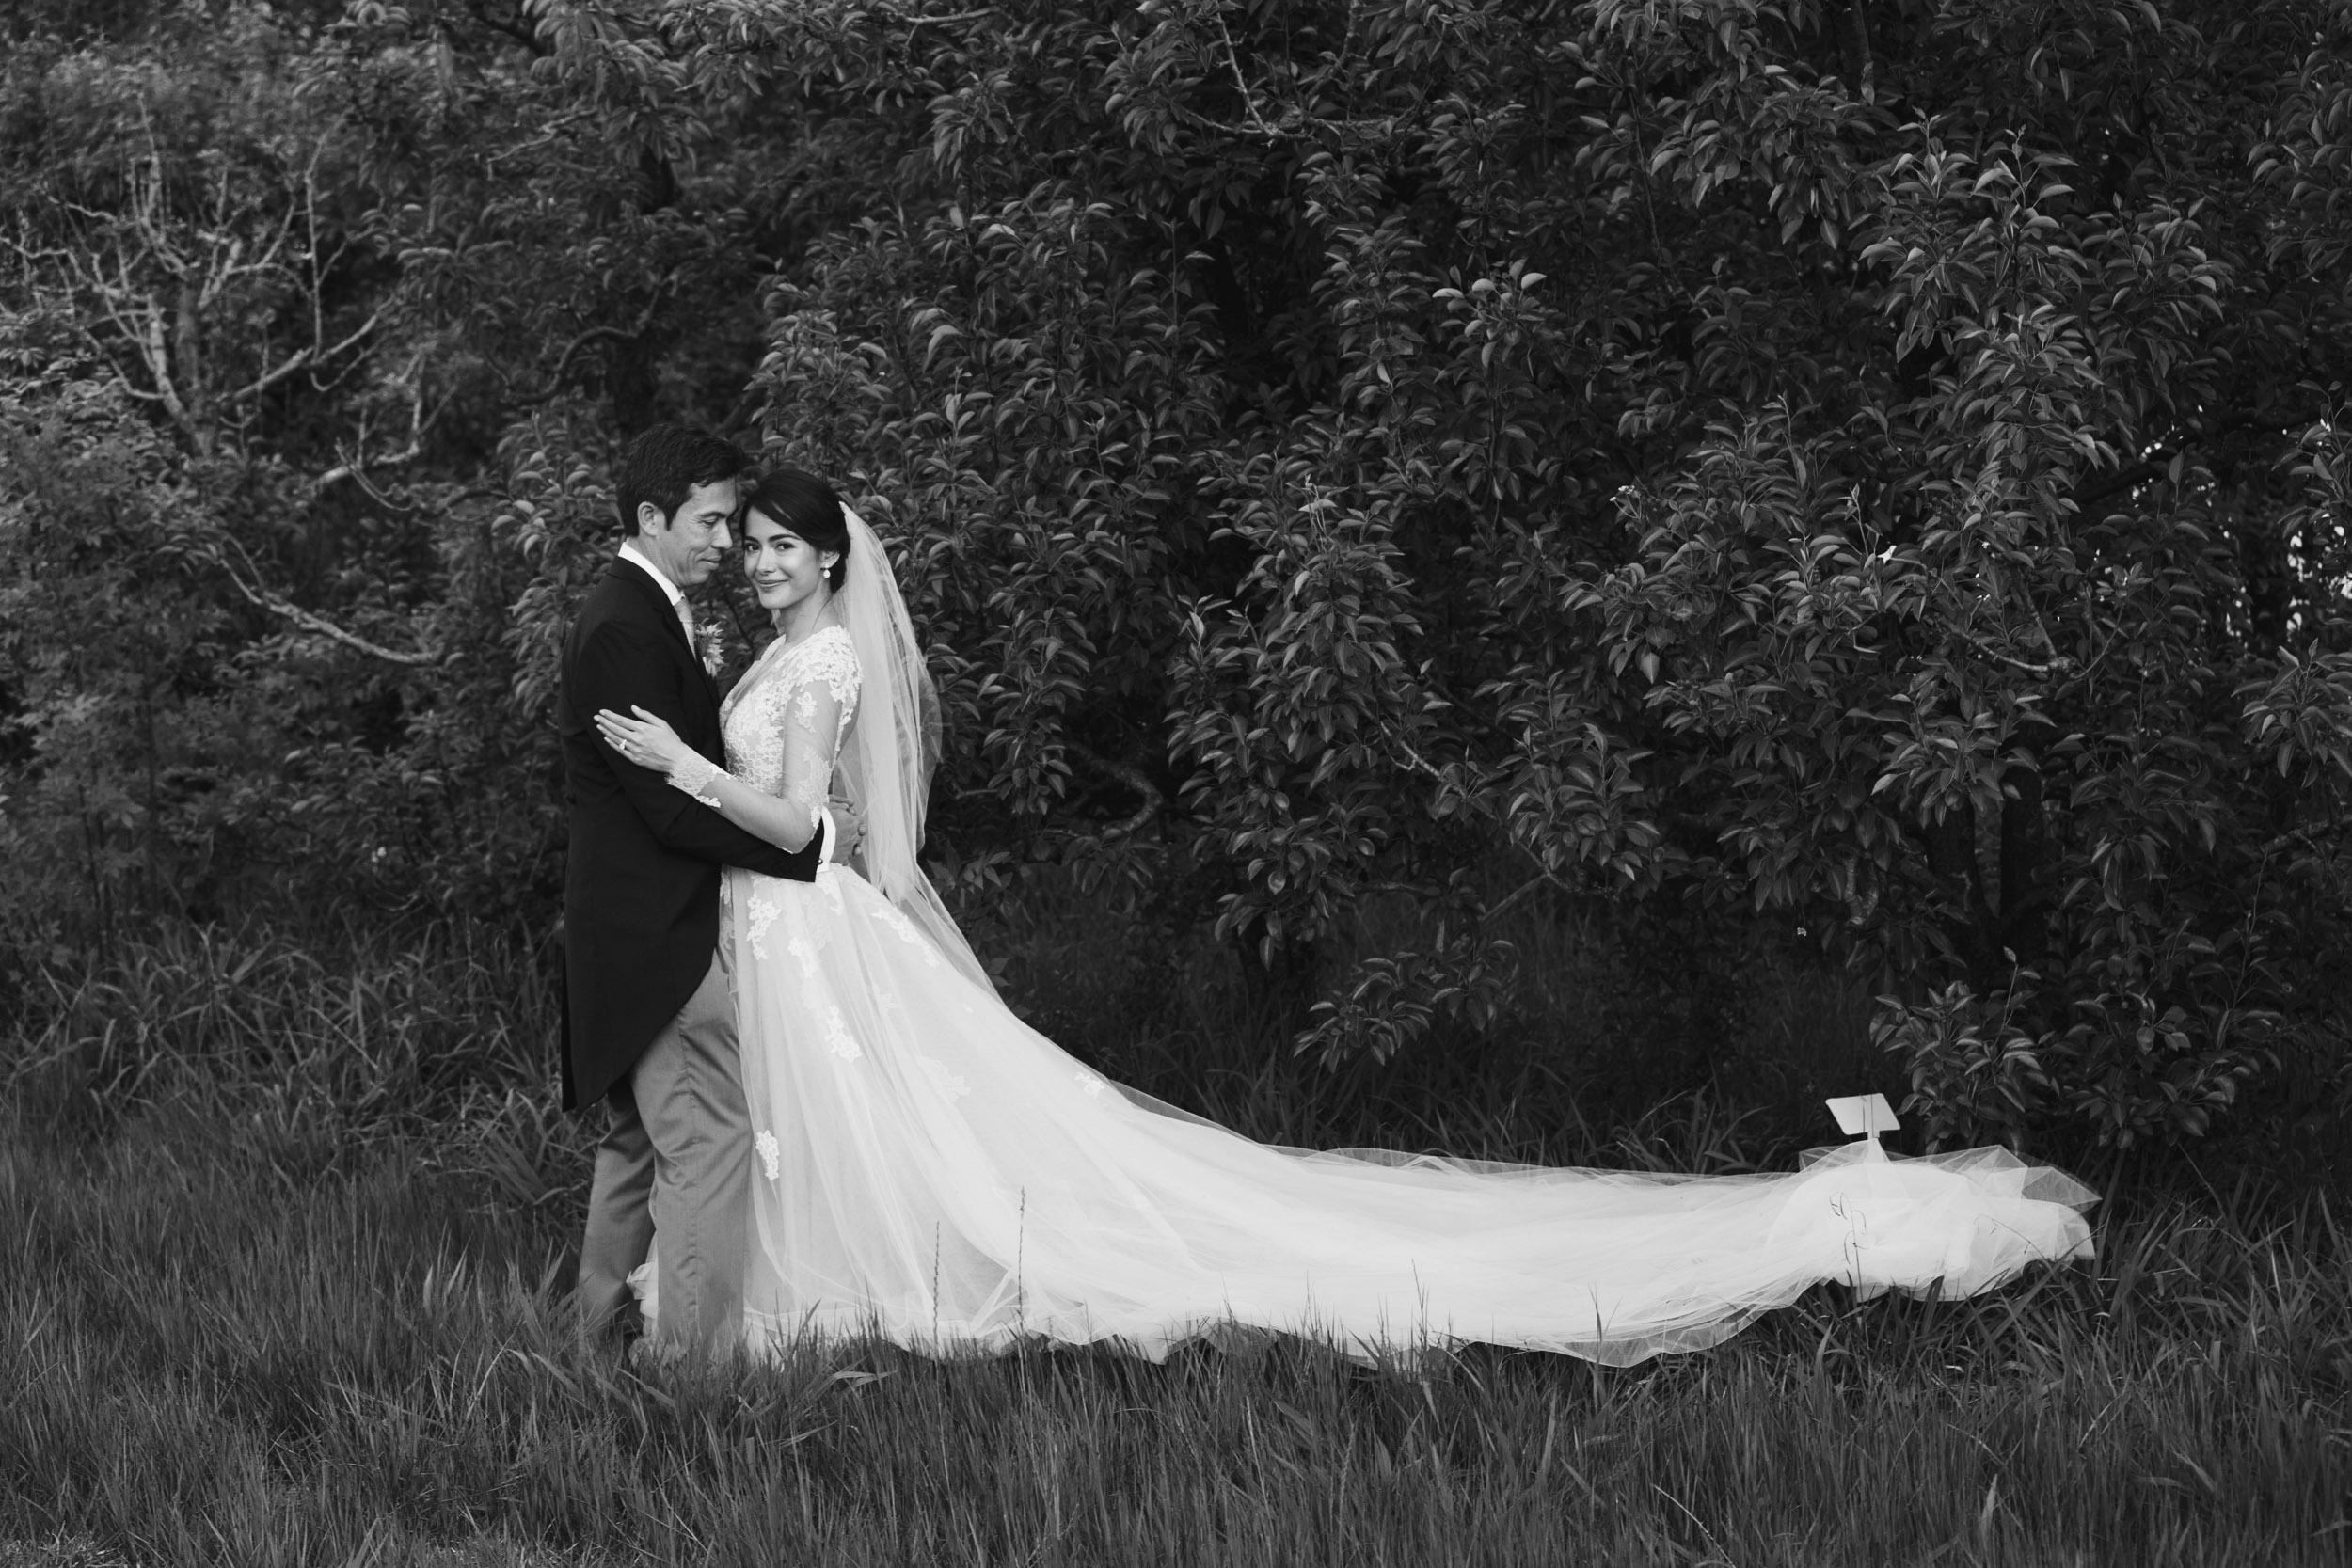 Jenny-Rockett-John-Scranton-Cape-Town-Wedding-Photographer-Andrea-Kellan-188.jpg